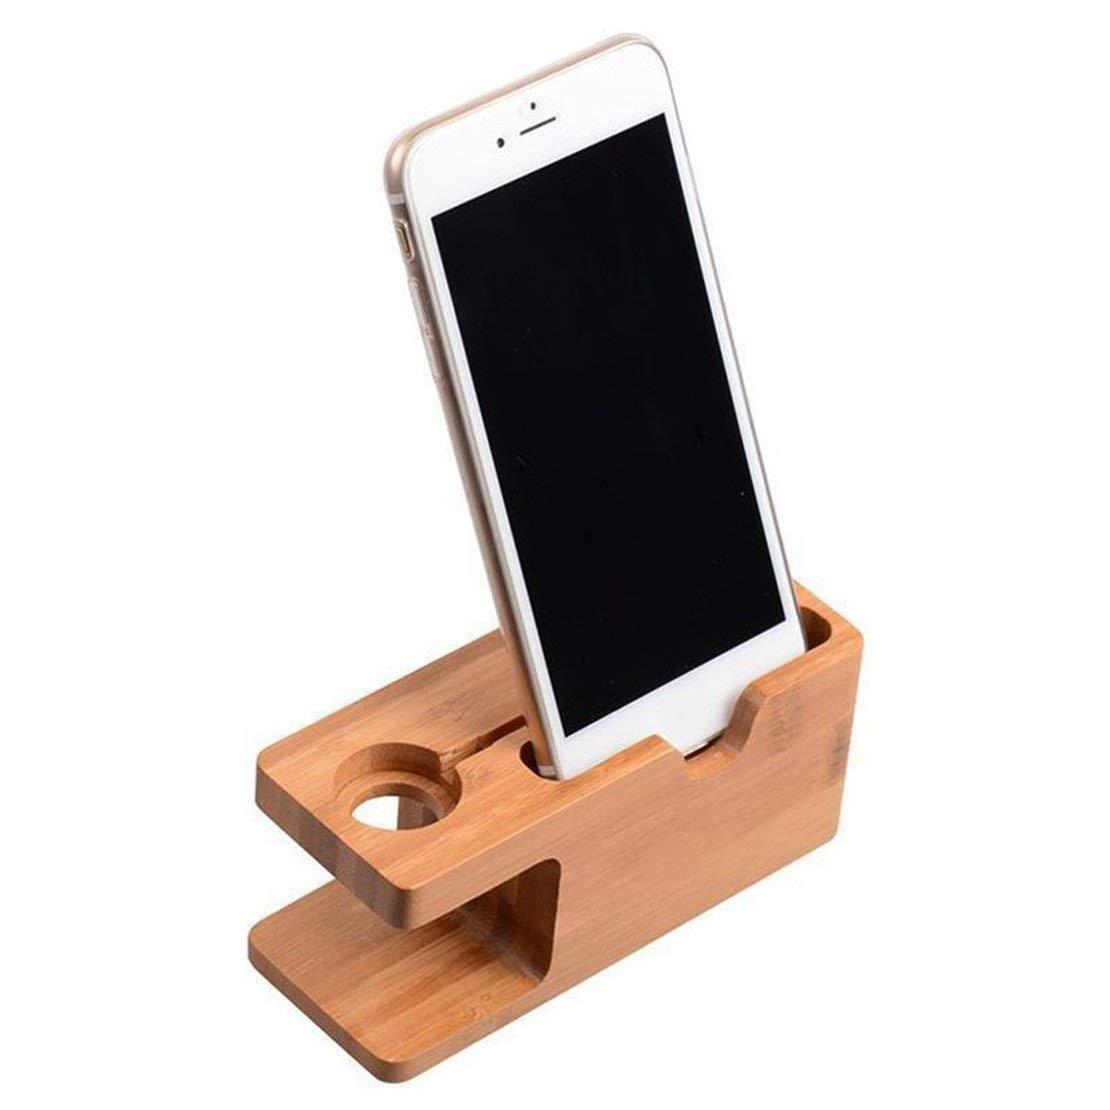 Multifunktionale 2-in-1 Ladestation Stand Station Uhr Telefon Ladeger/ät Holz Halter Space Saver f/ür iWatch f/ür iPhone